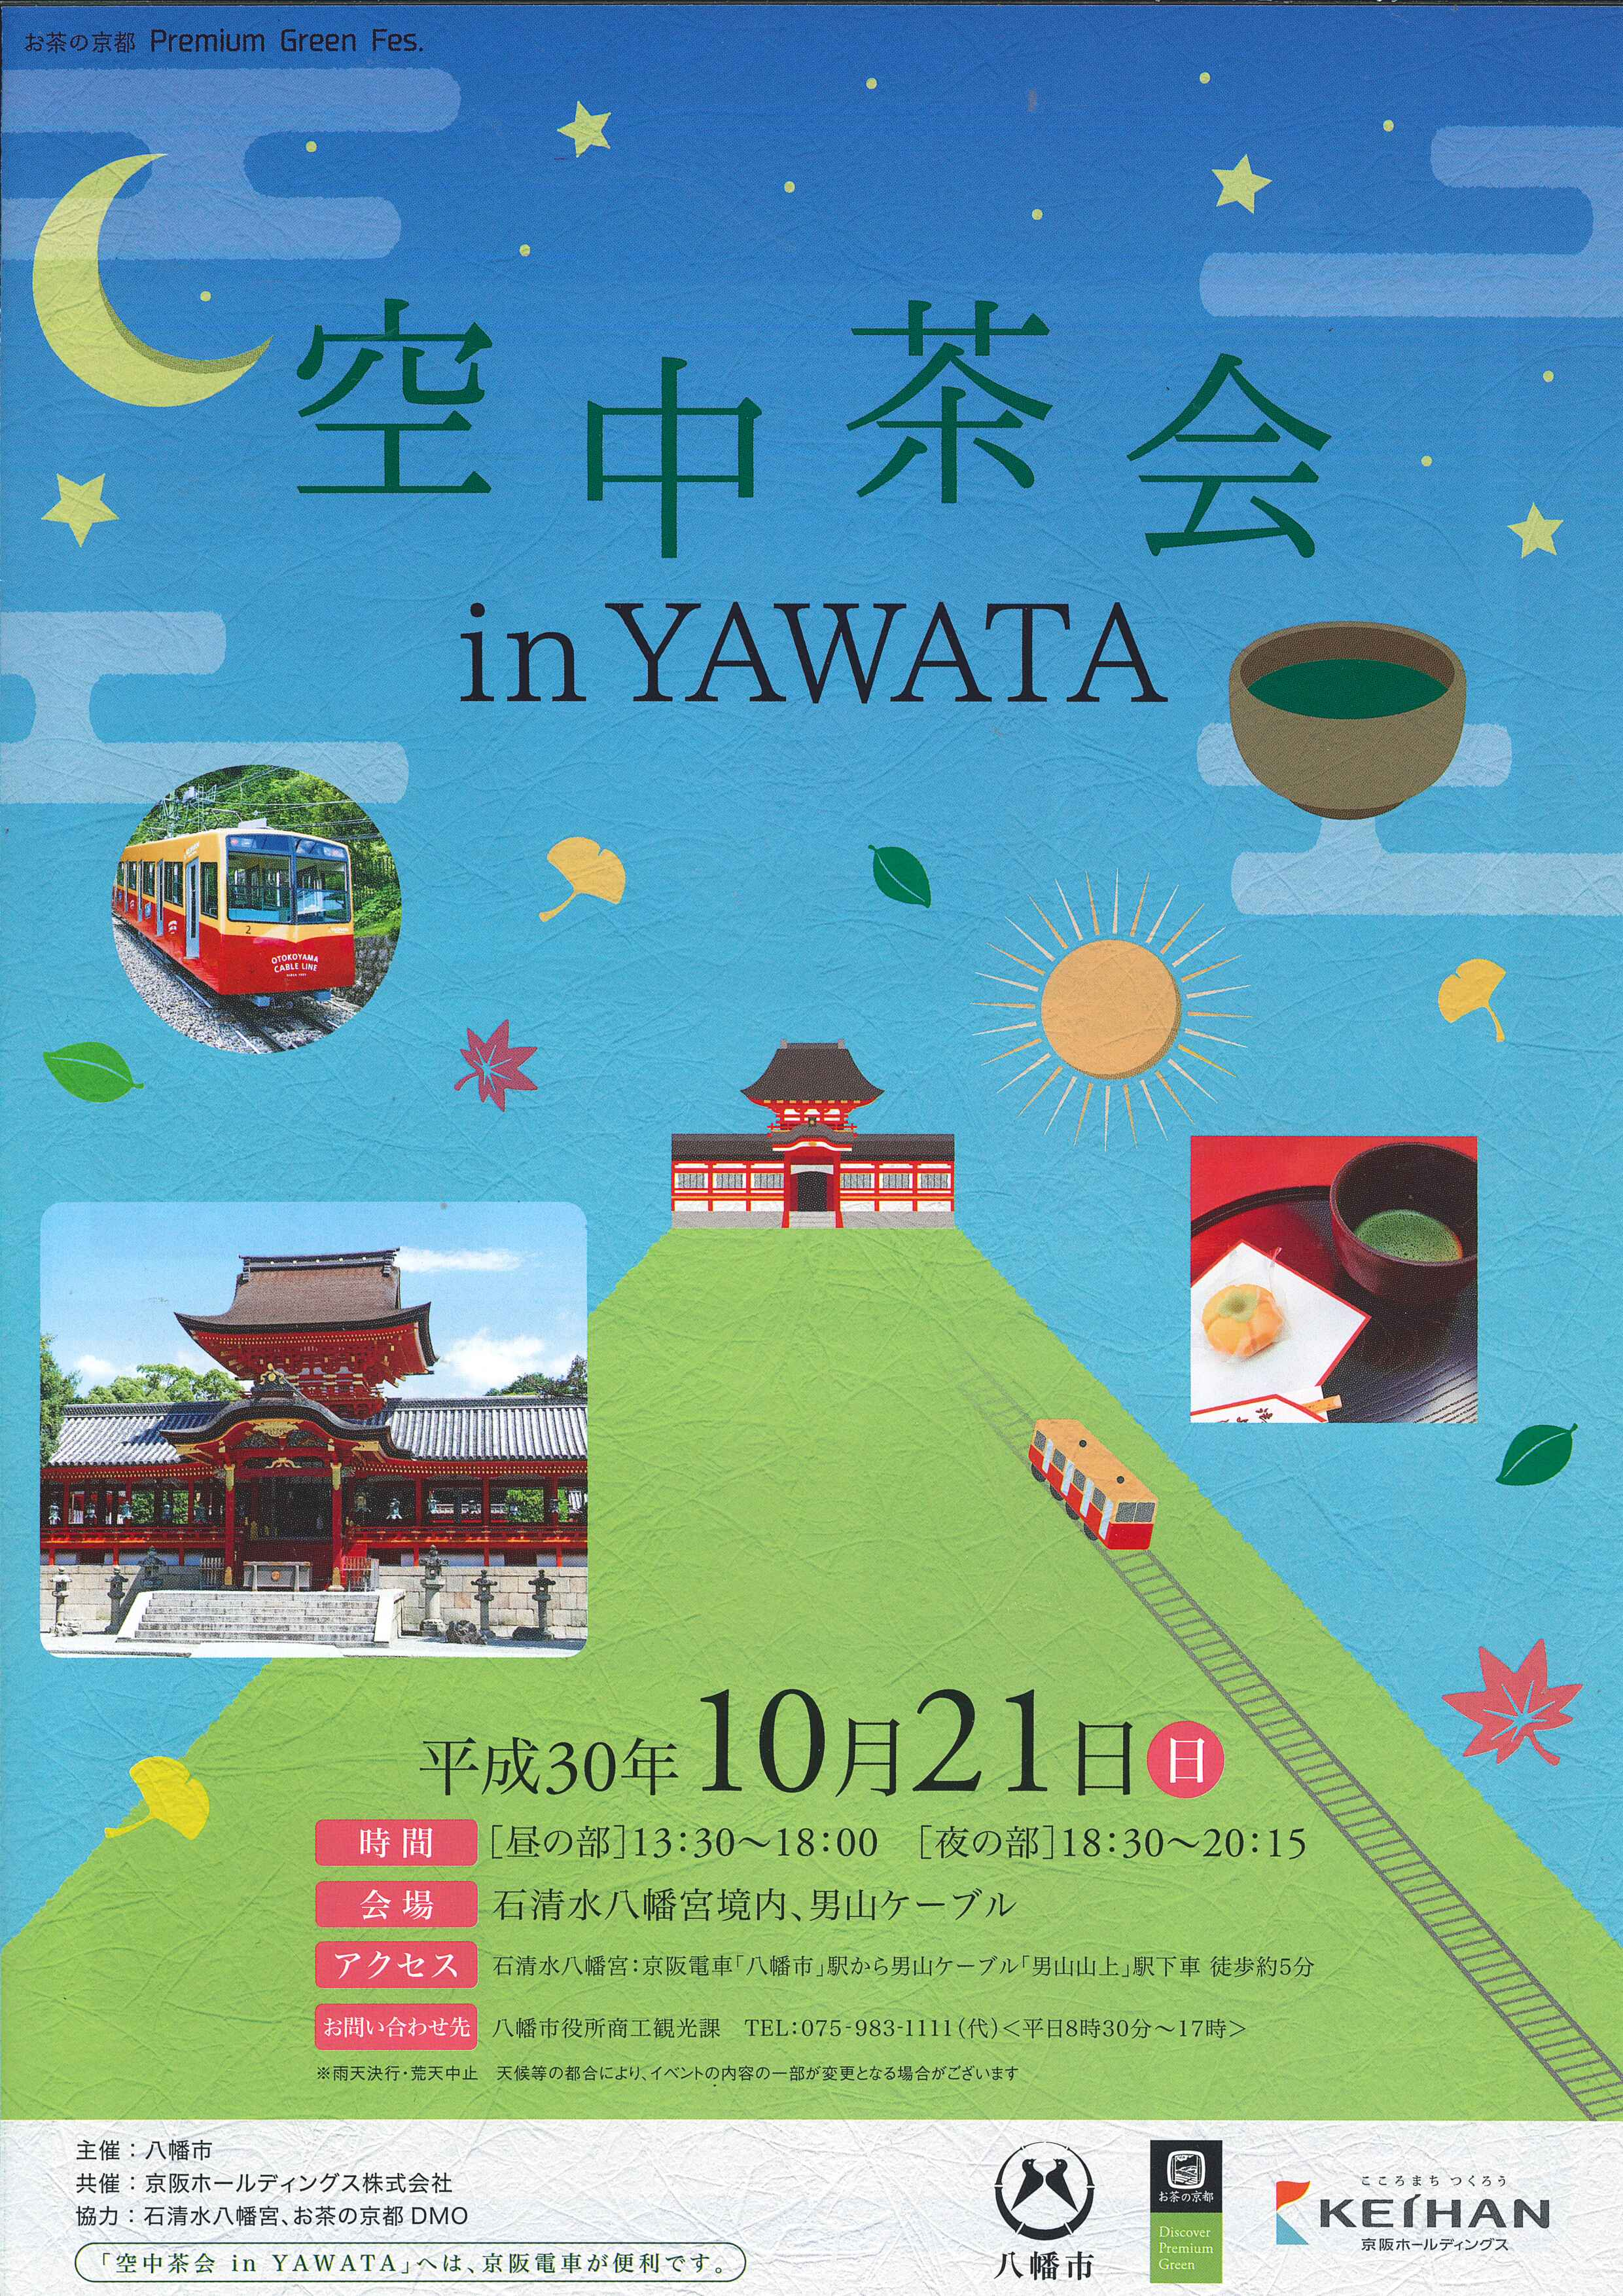 空中茶室 in YAWATA